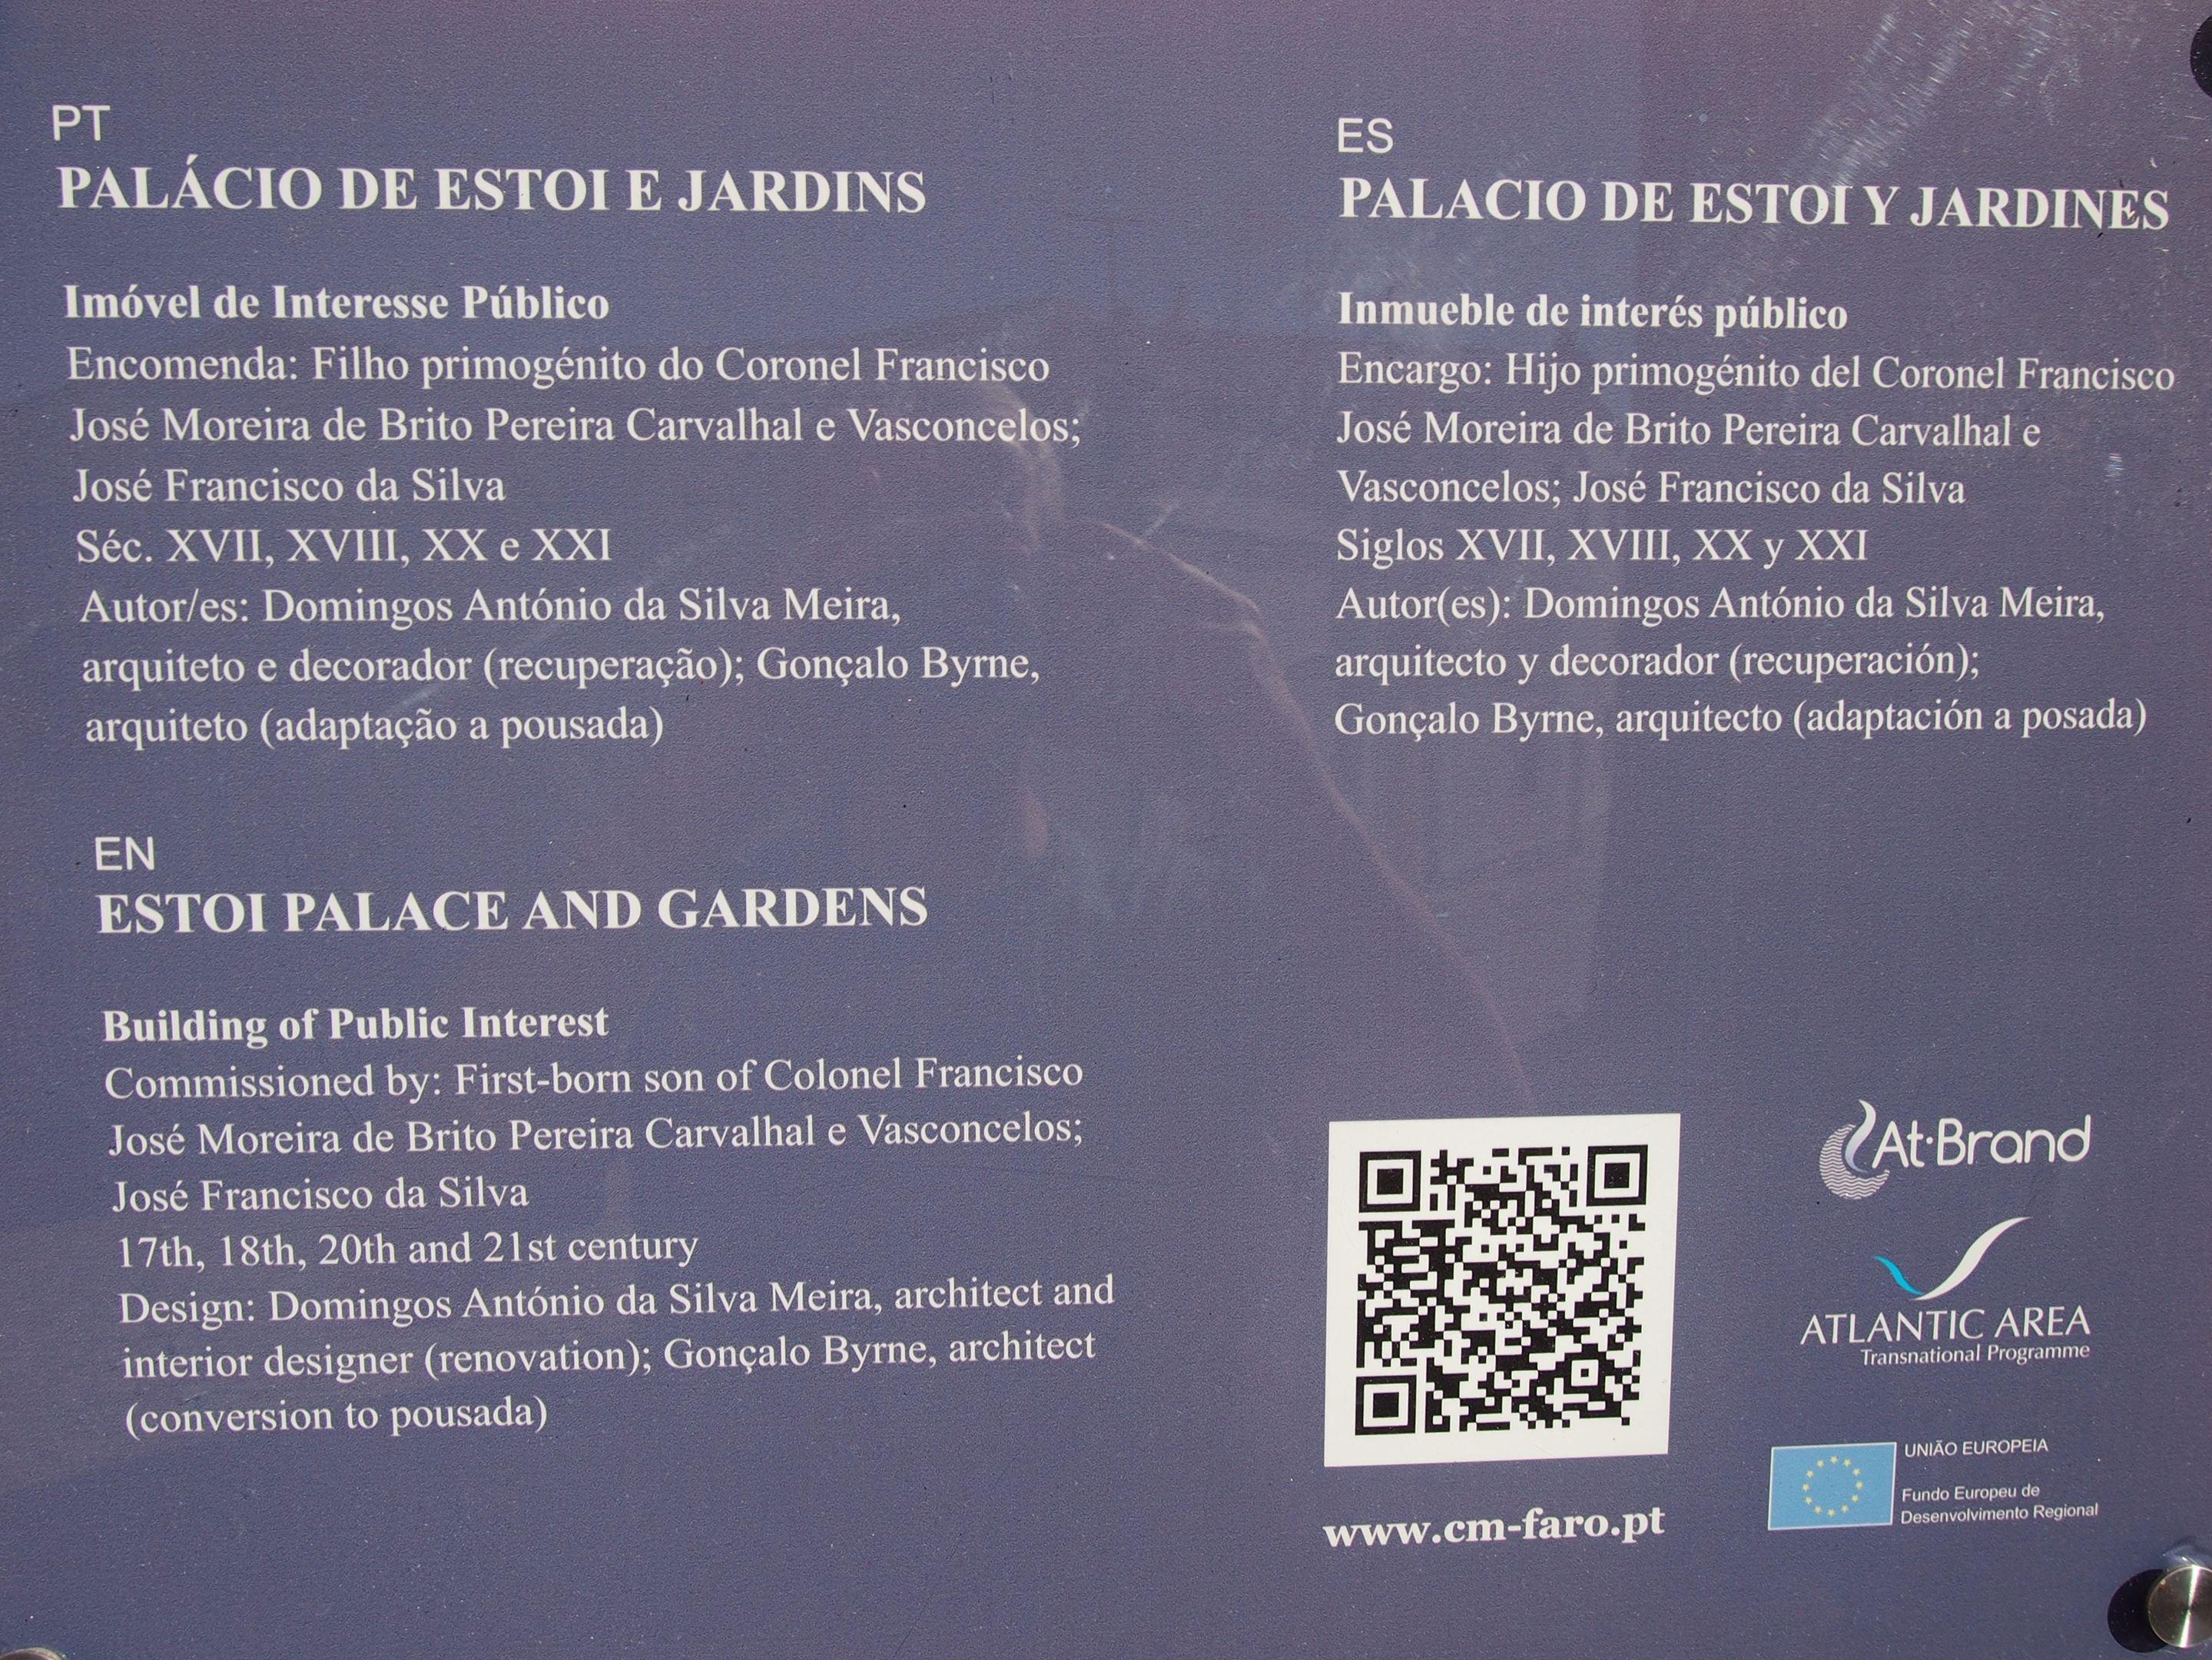 Estoi Palace - historical facts